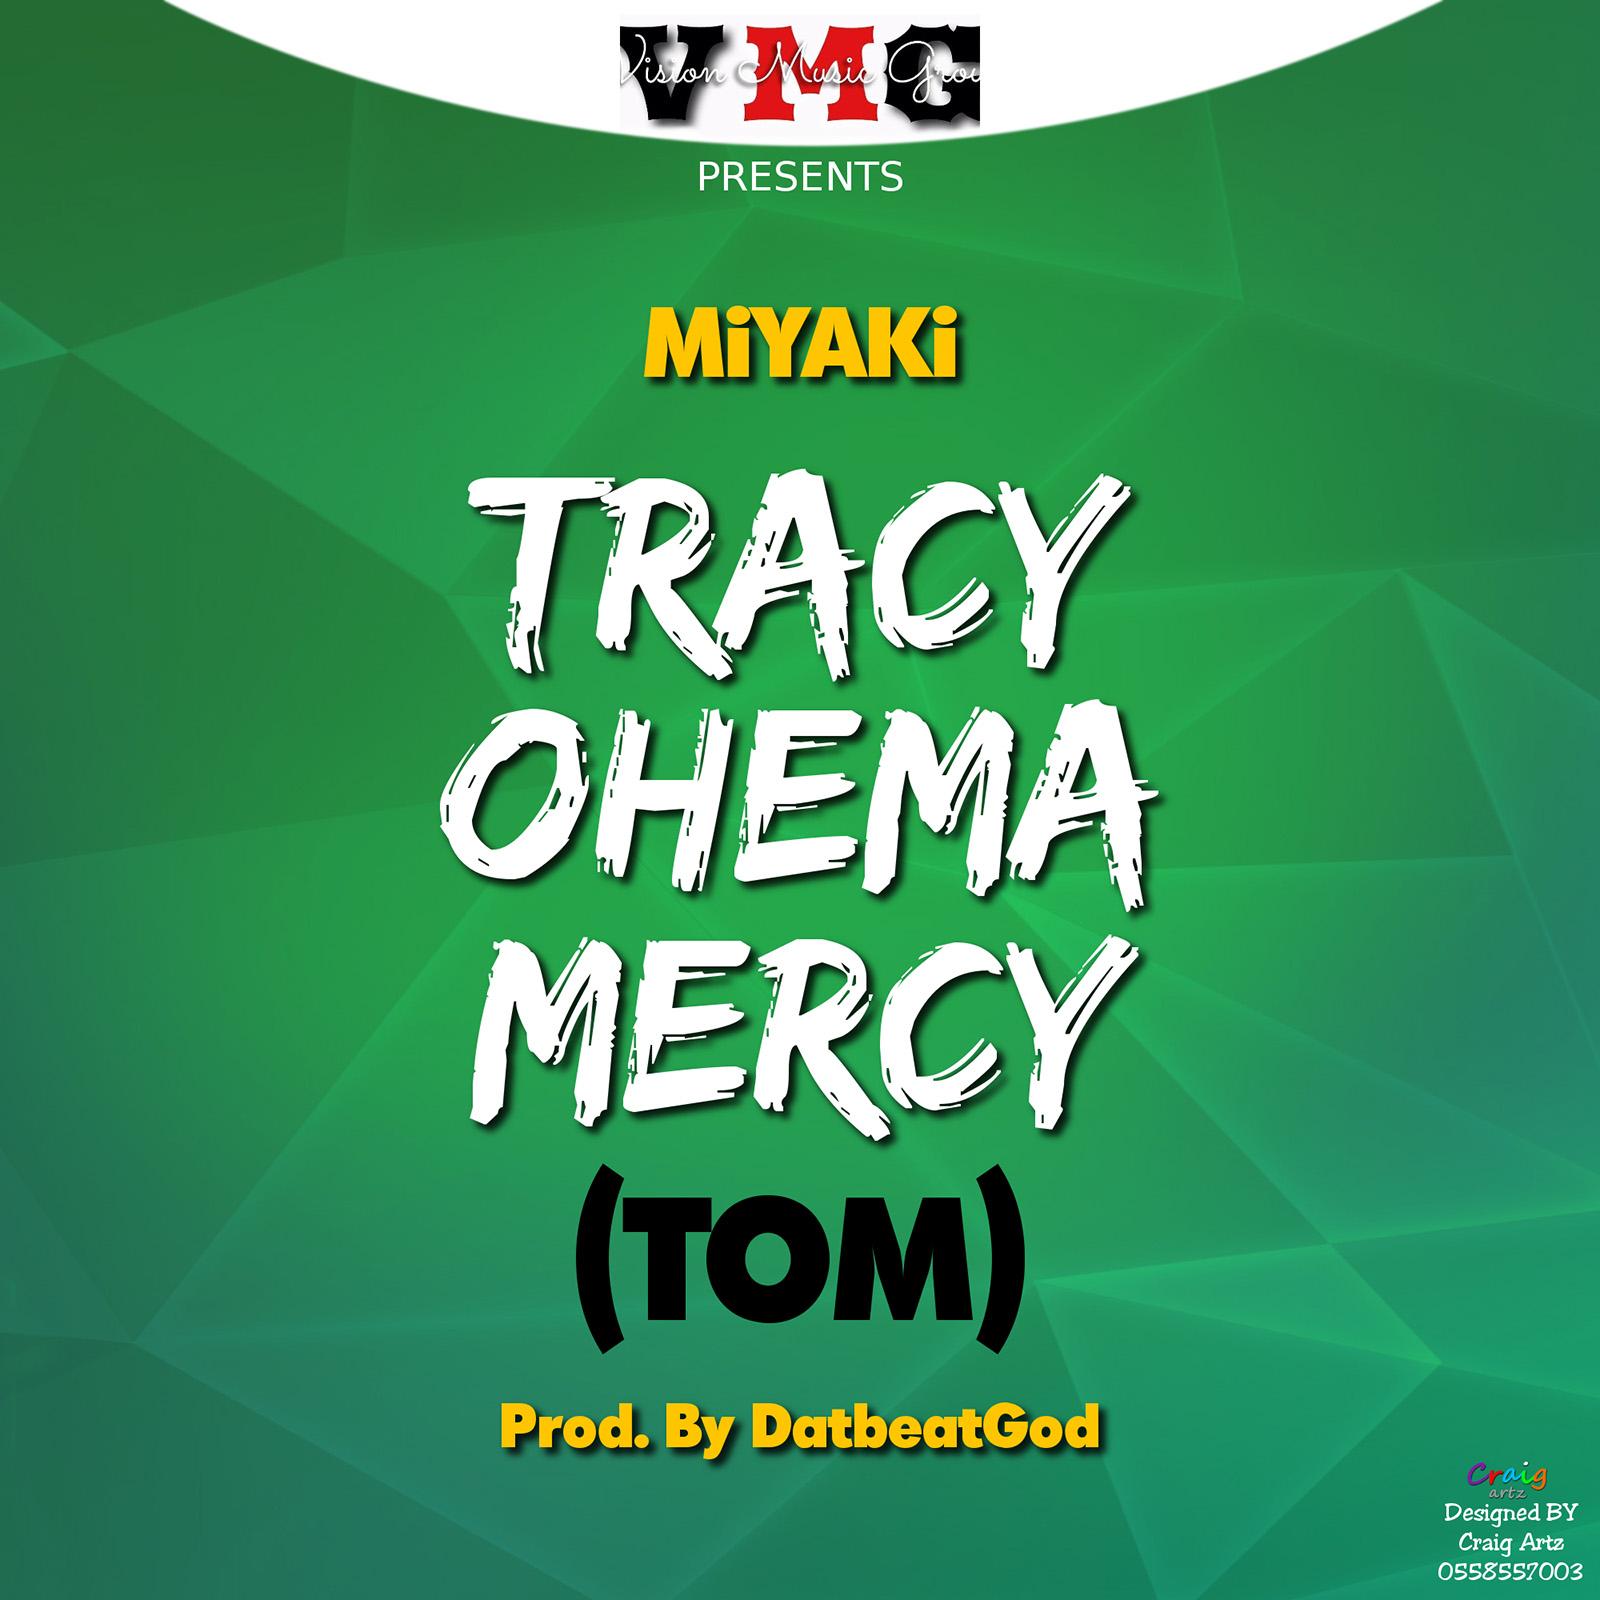 Tracy Ohema Mercy (TOM) by Miyaki